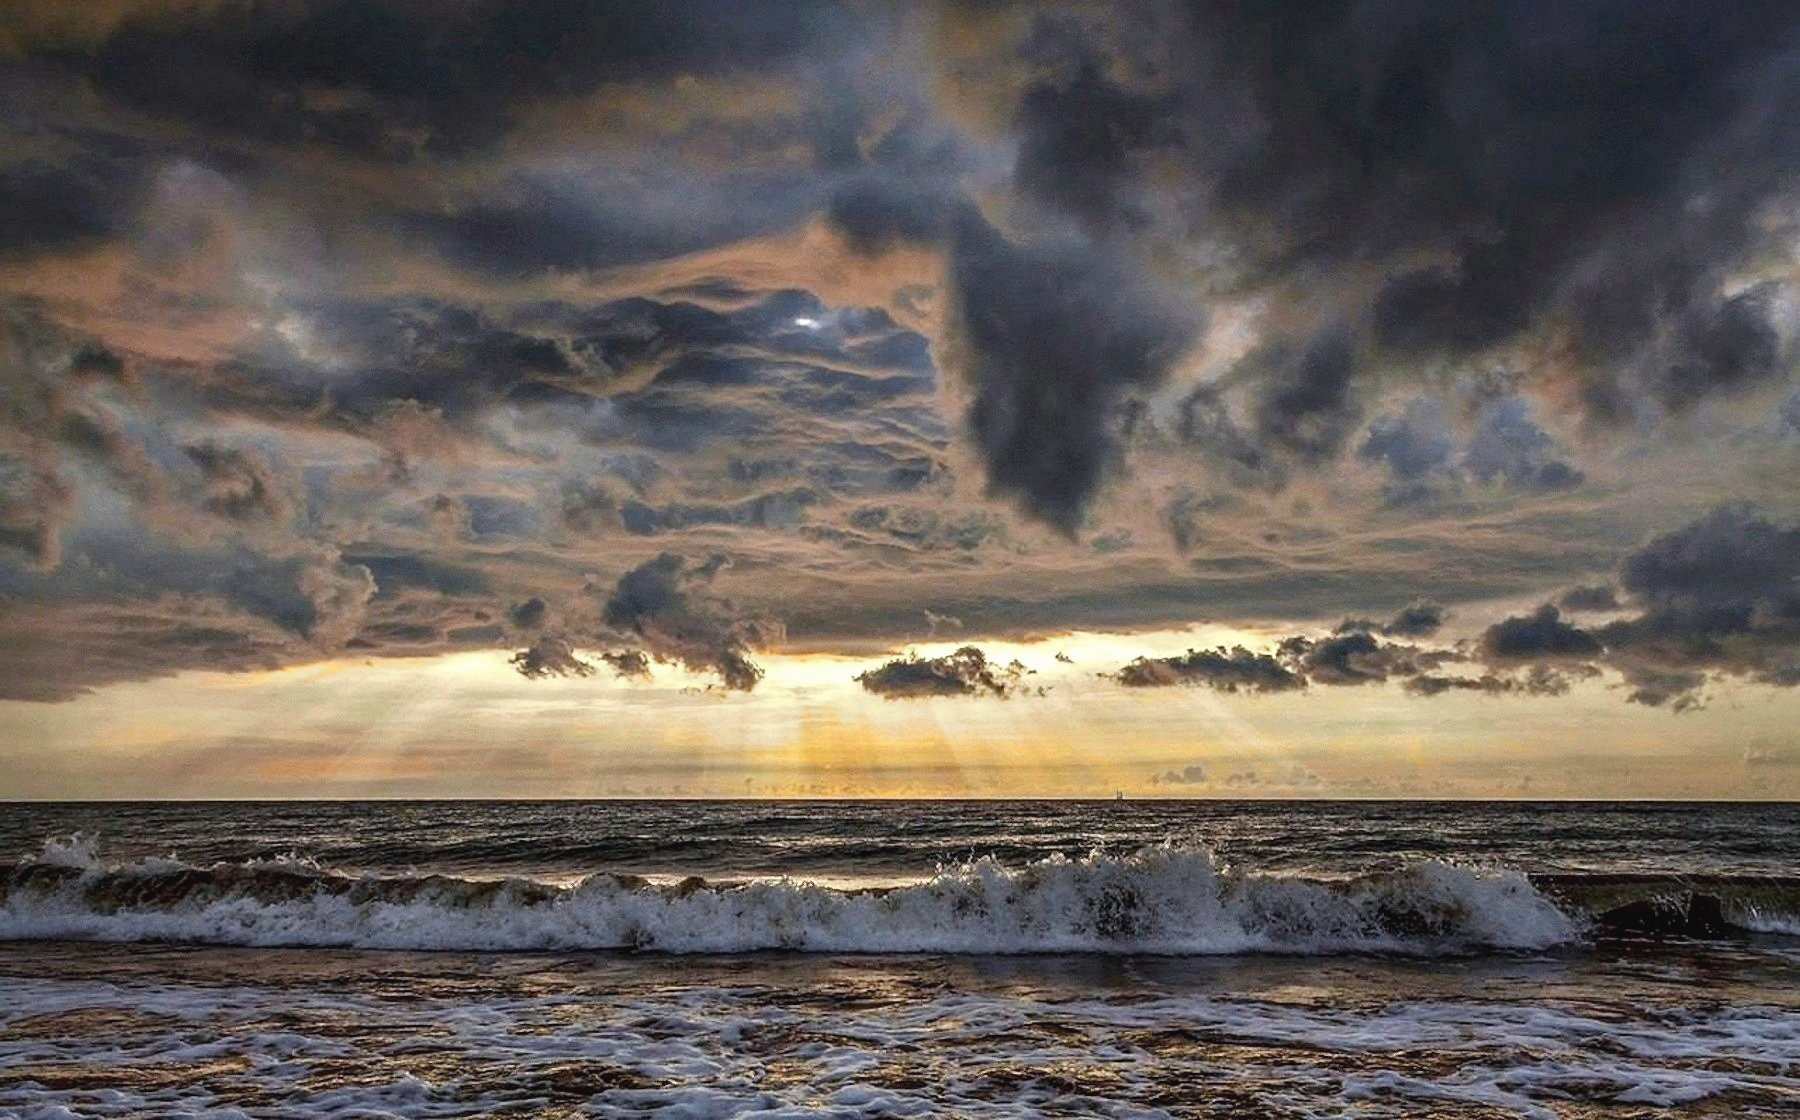 00 Nikolai Pogodin. Contact (Baltic Sea). 2015